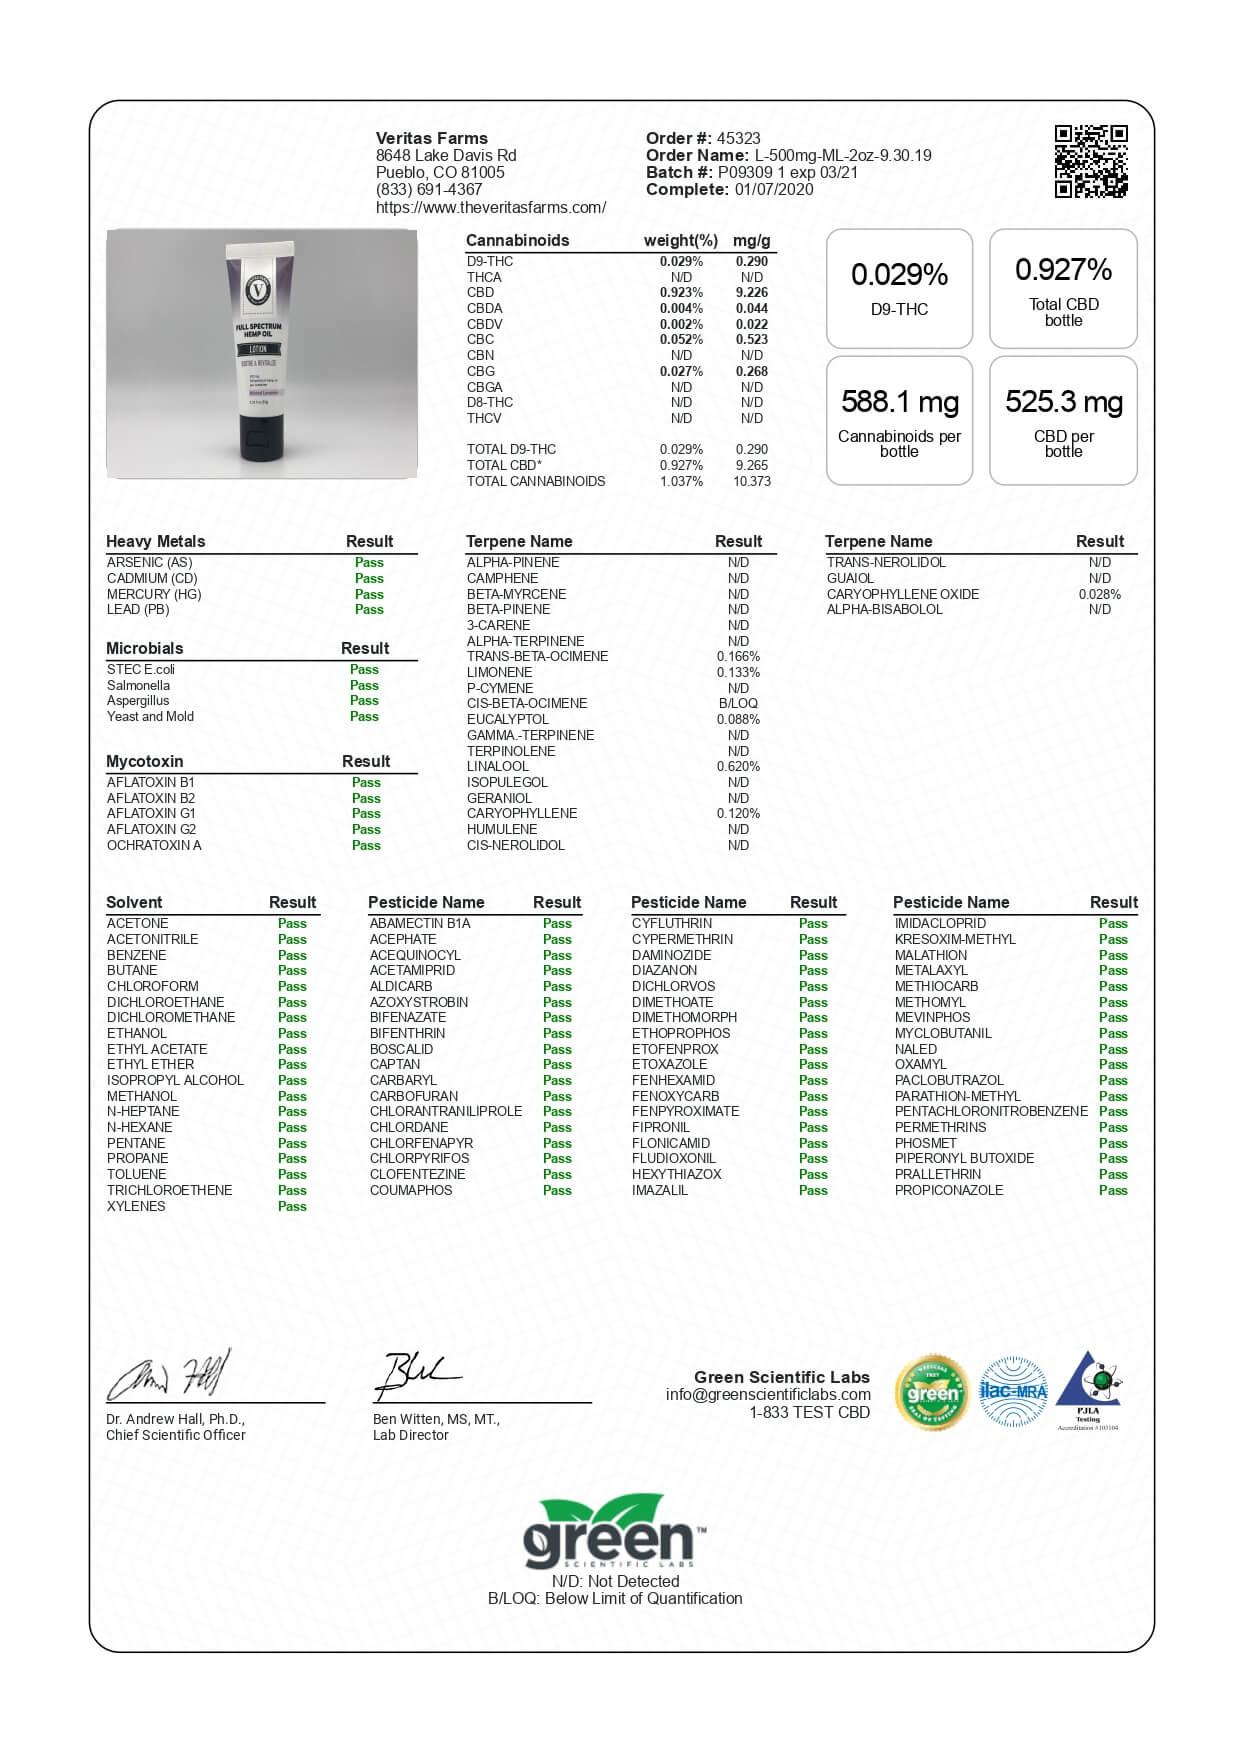 Veritas Farms CBD Topical Full Spectrum Minted Lavender Lotion 500mg Lab Report